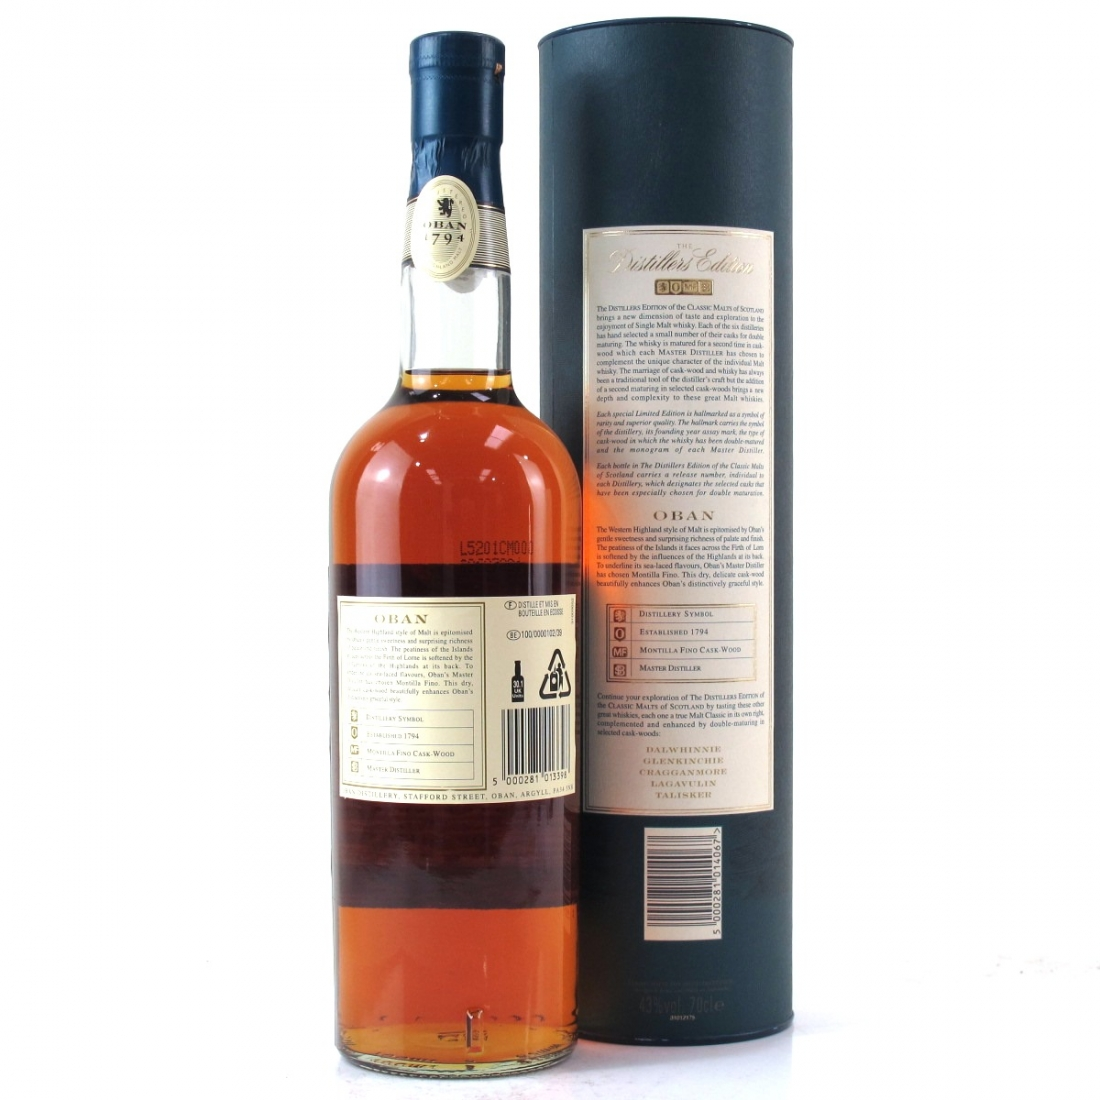 Oban 1991 Distillers Edition 2005